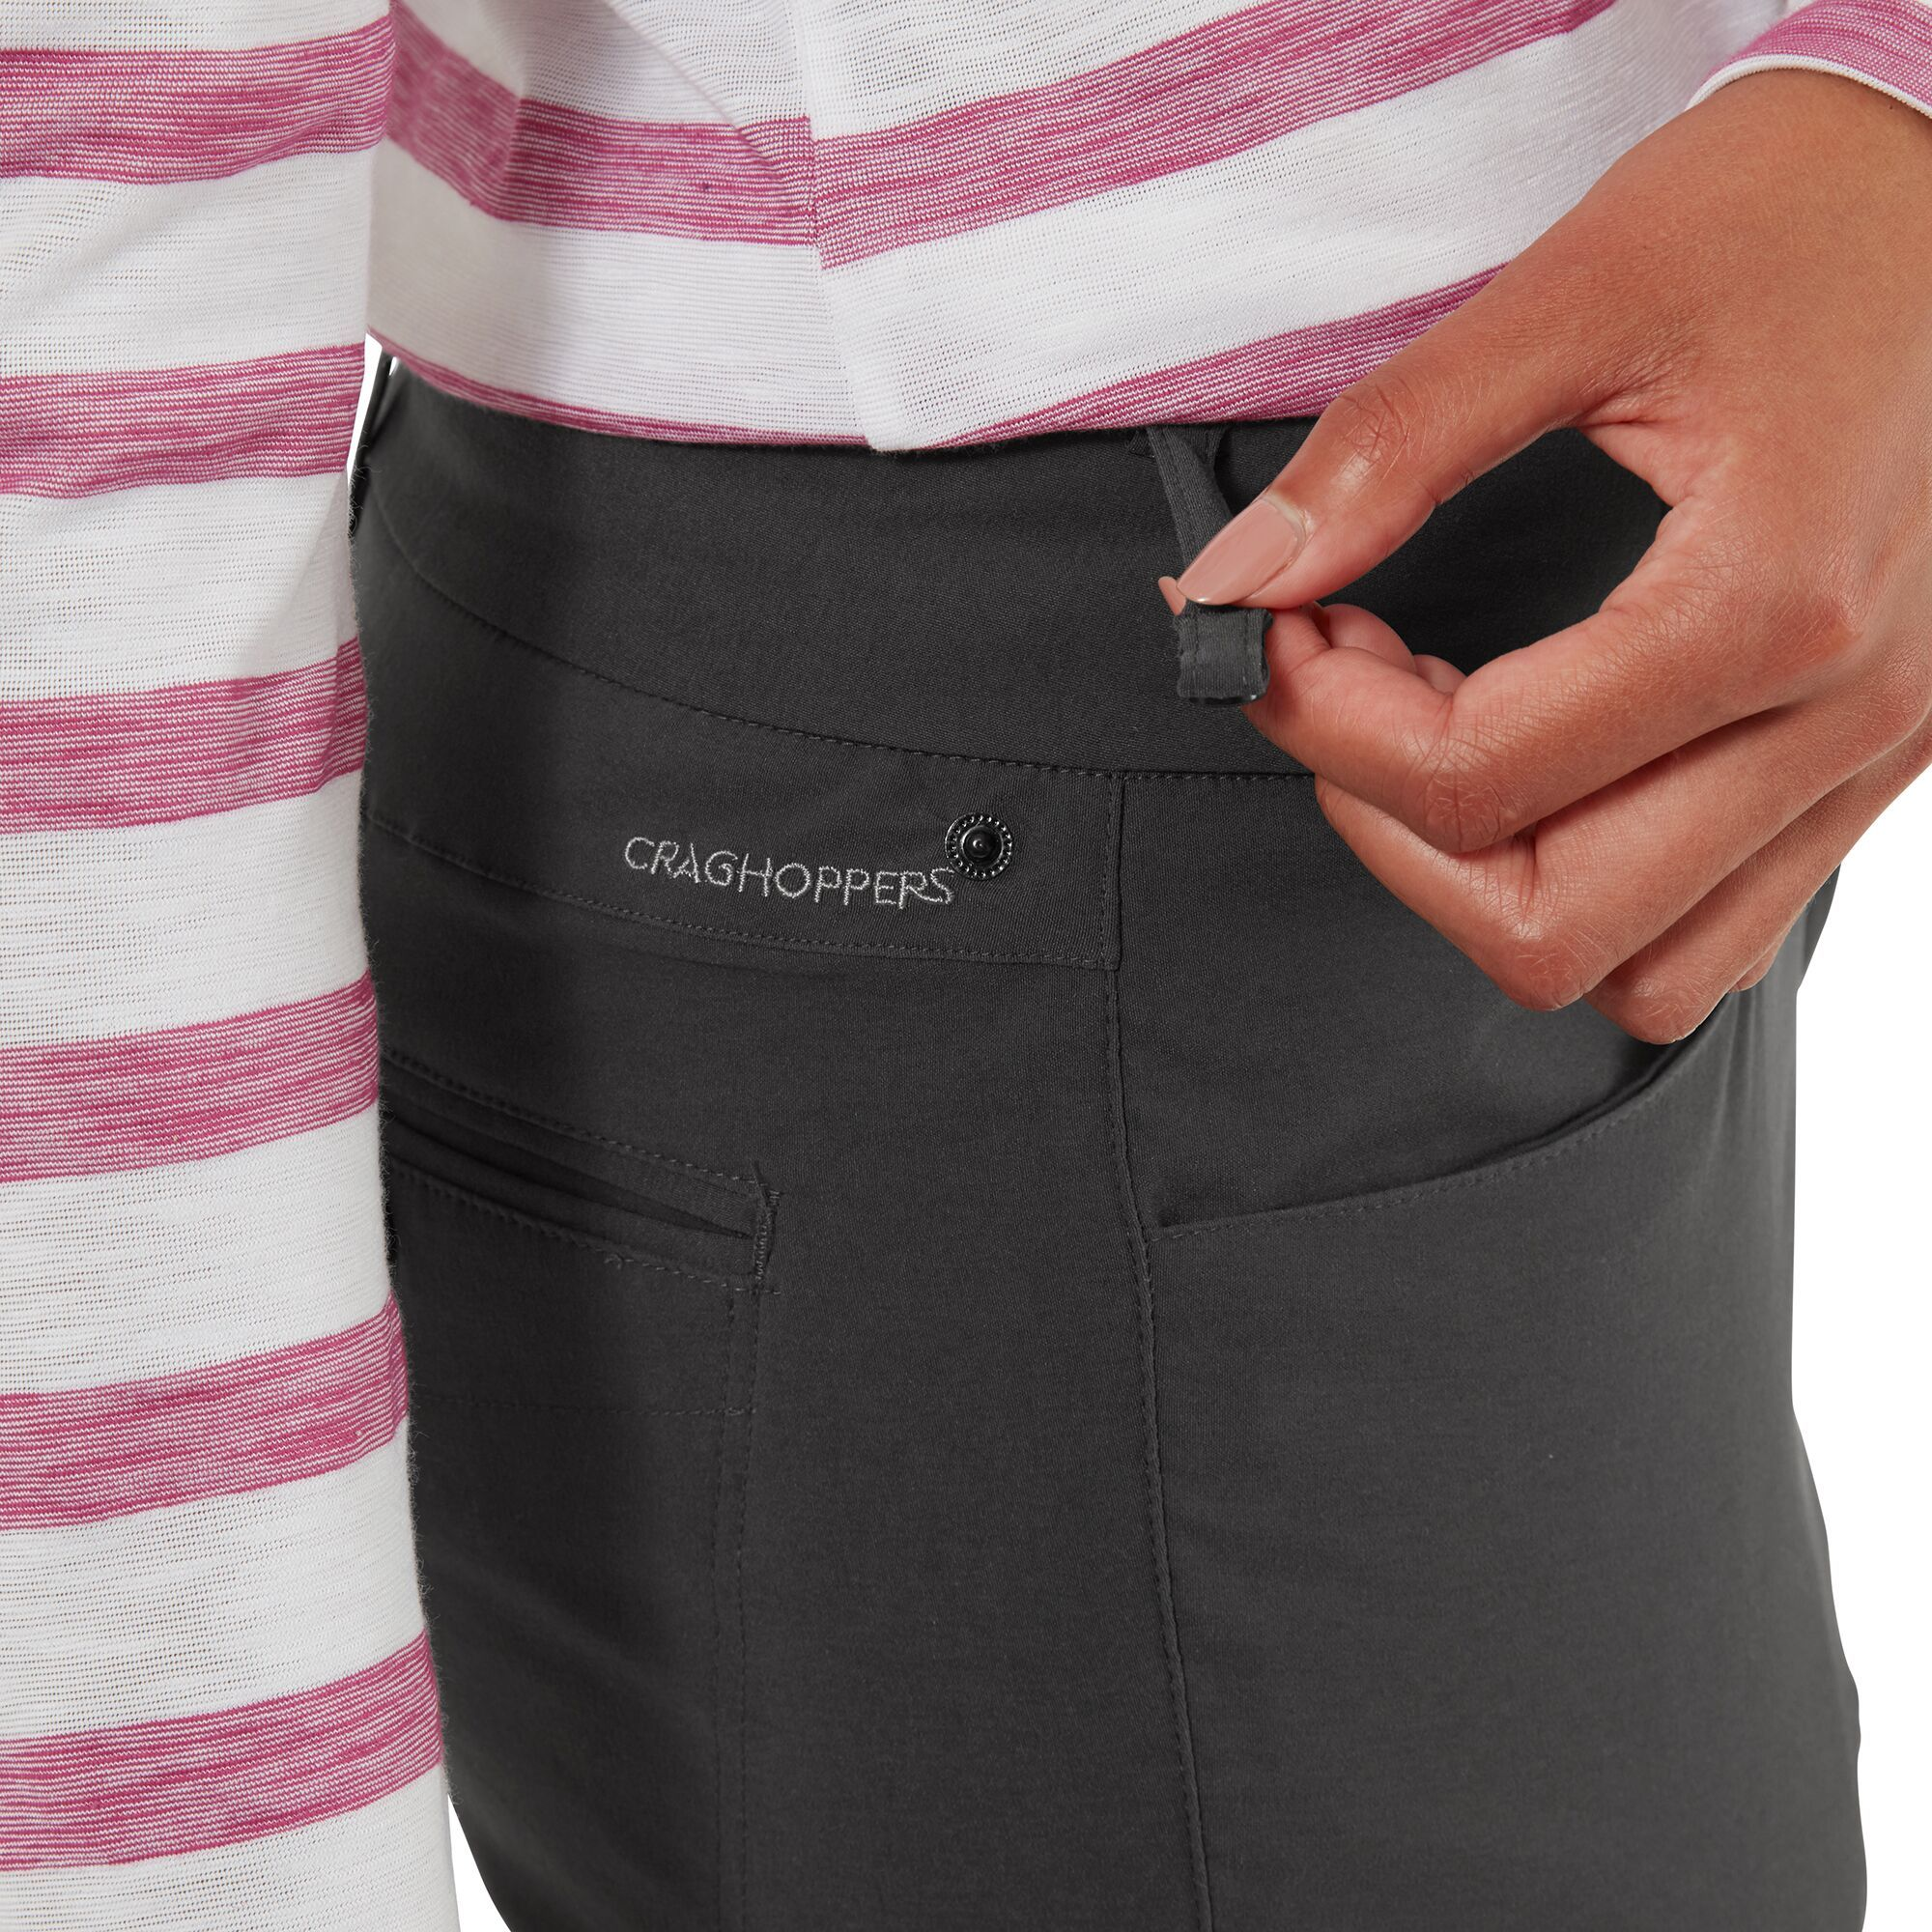 Craghoppers-Pantalon-CLARA-Femme-CG1066 miniature 10